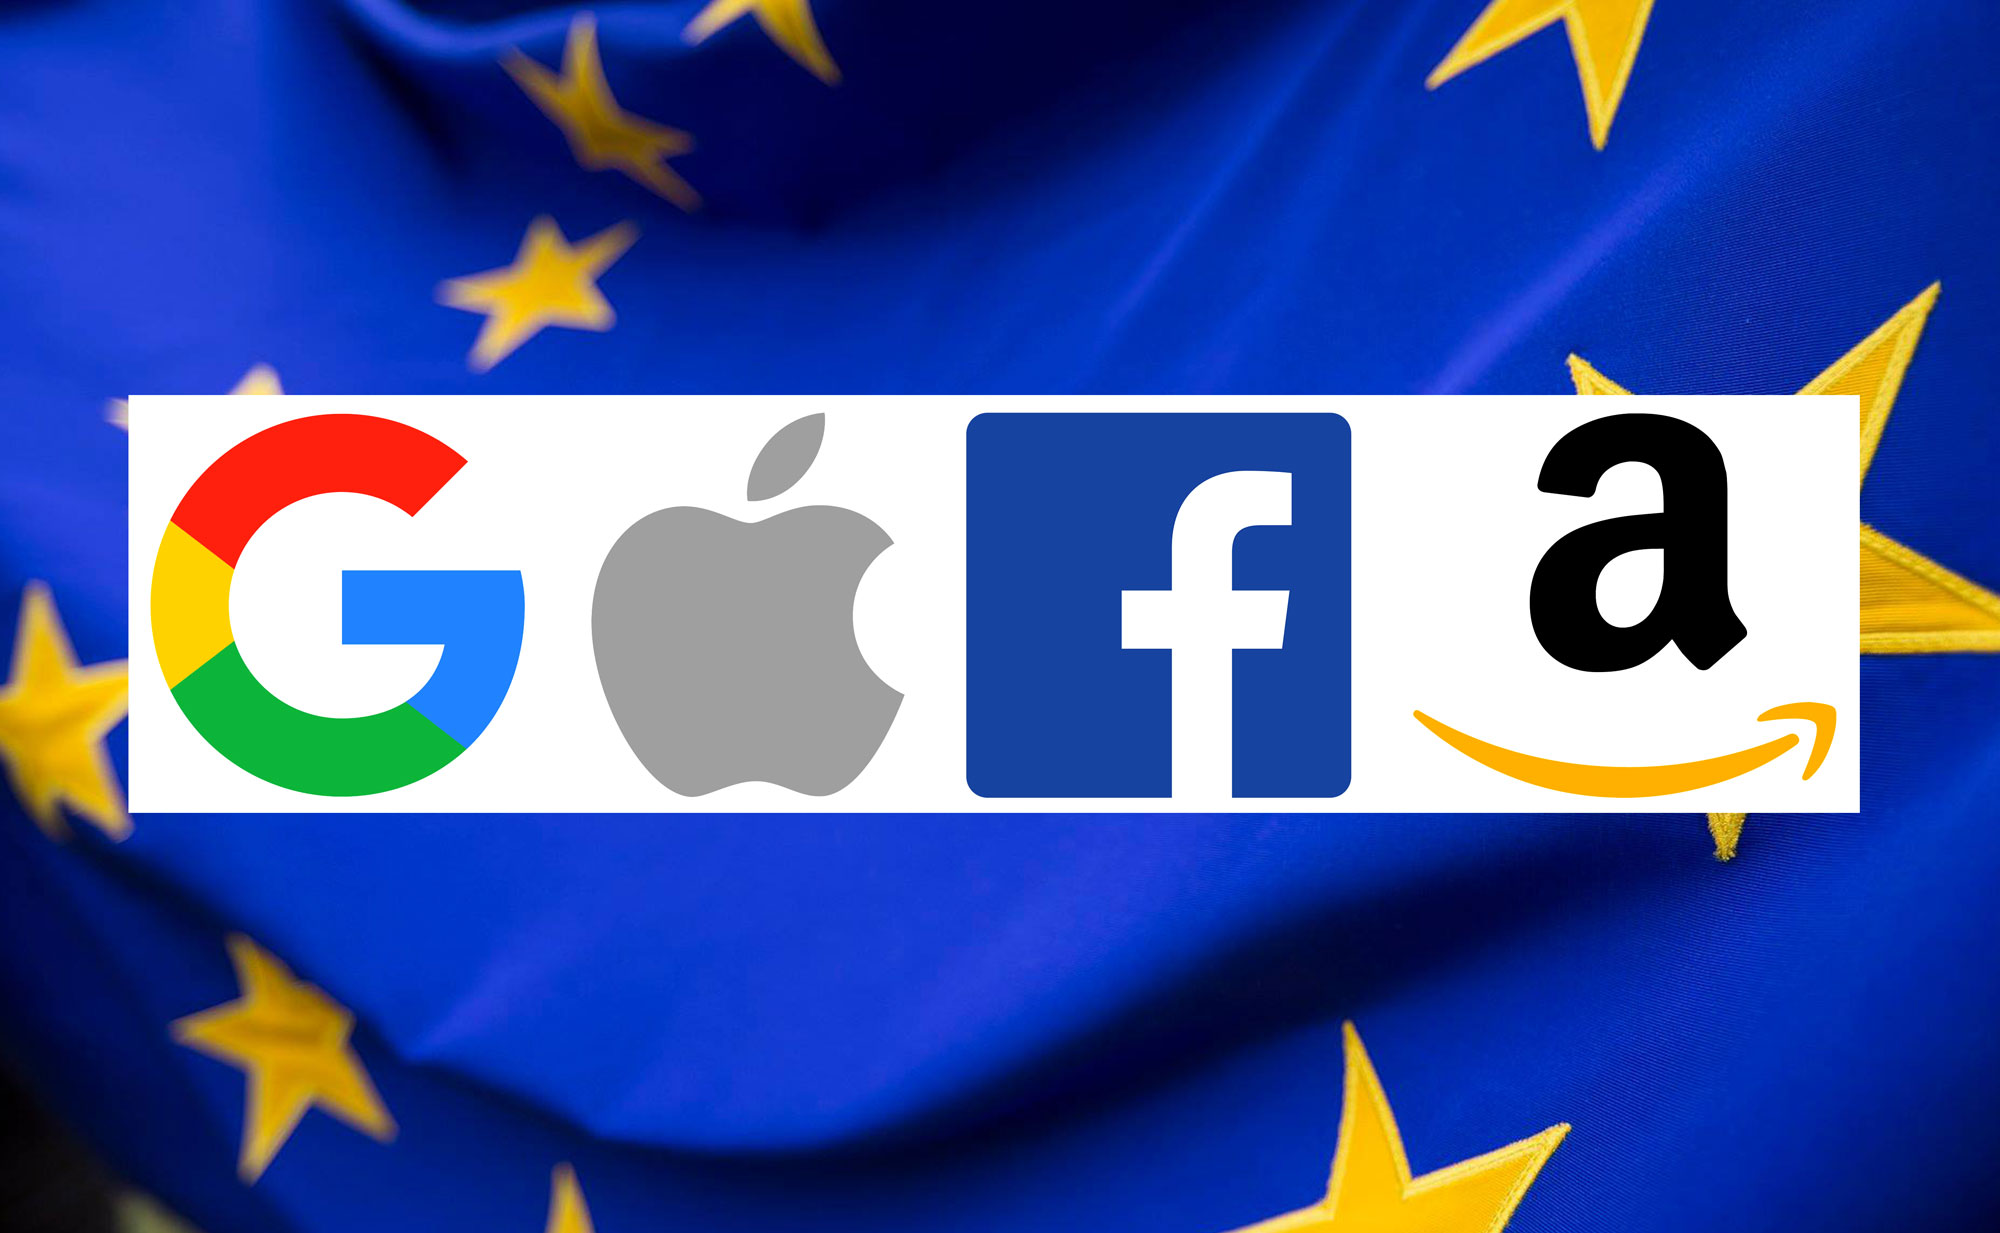 GAFA logos Google, Apple, Facebook, Amazon Europe